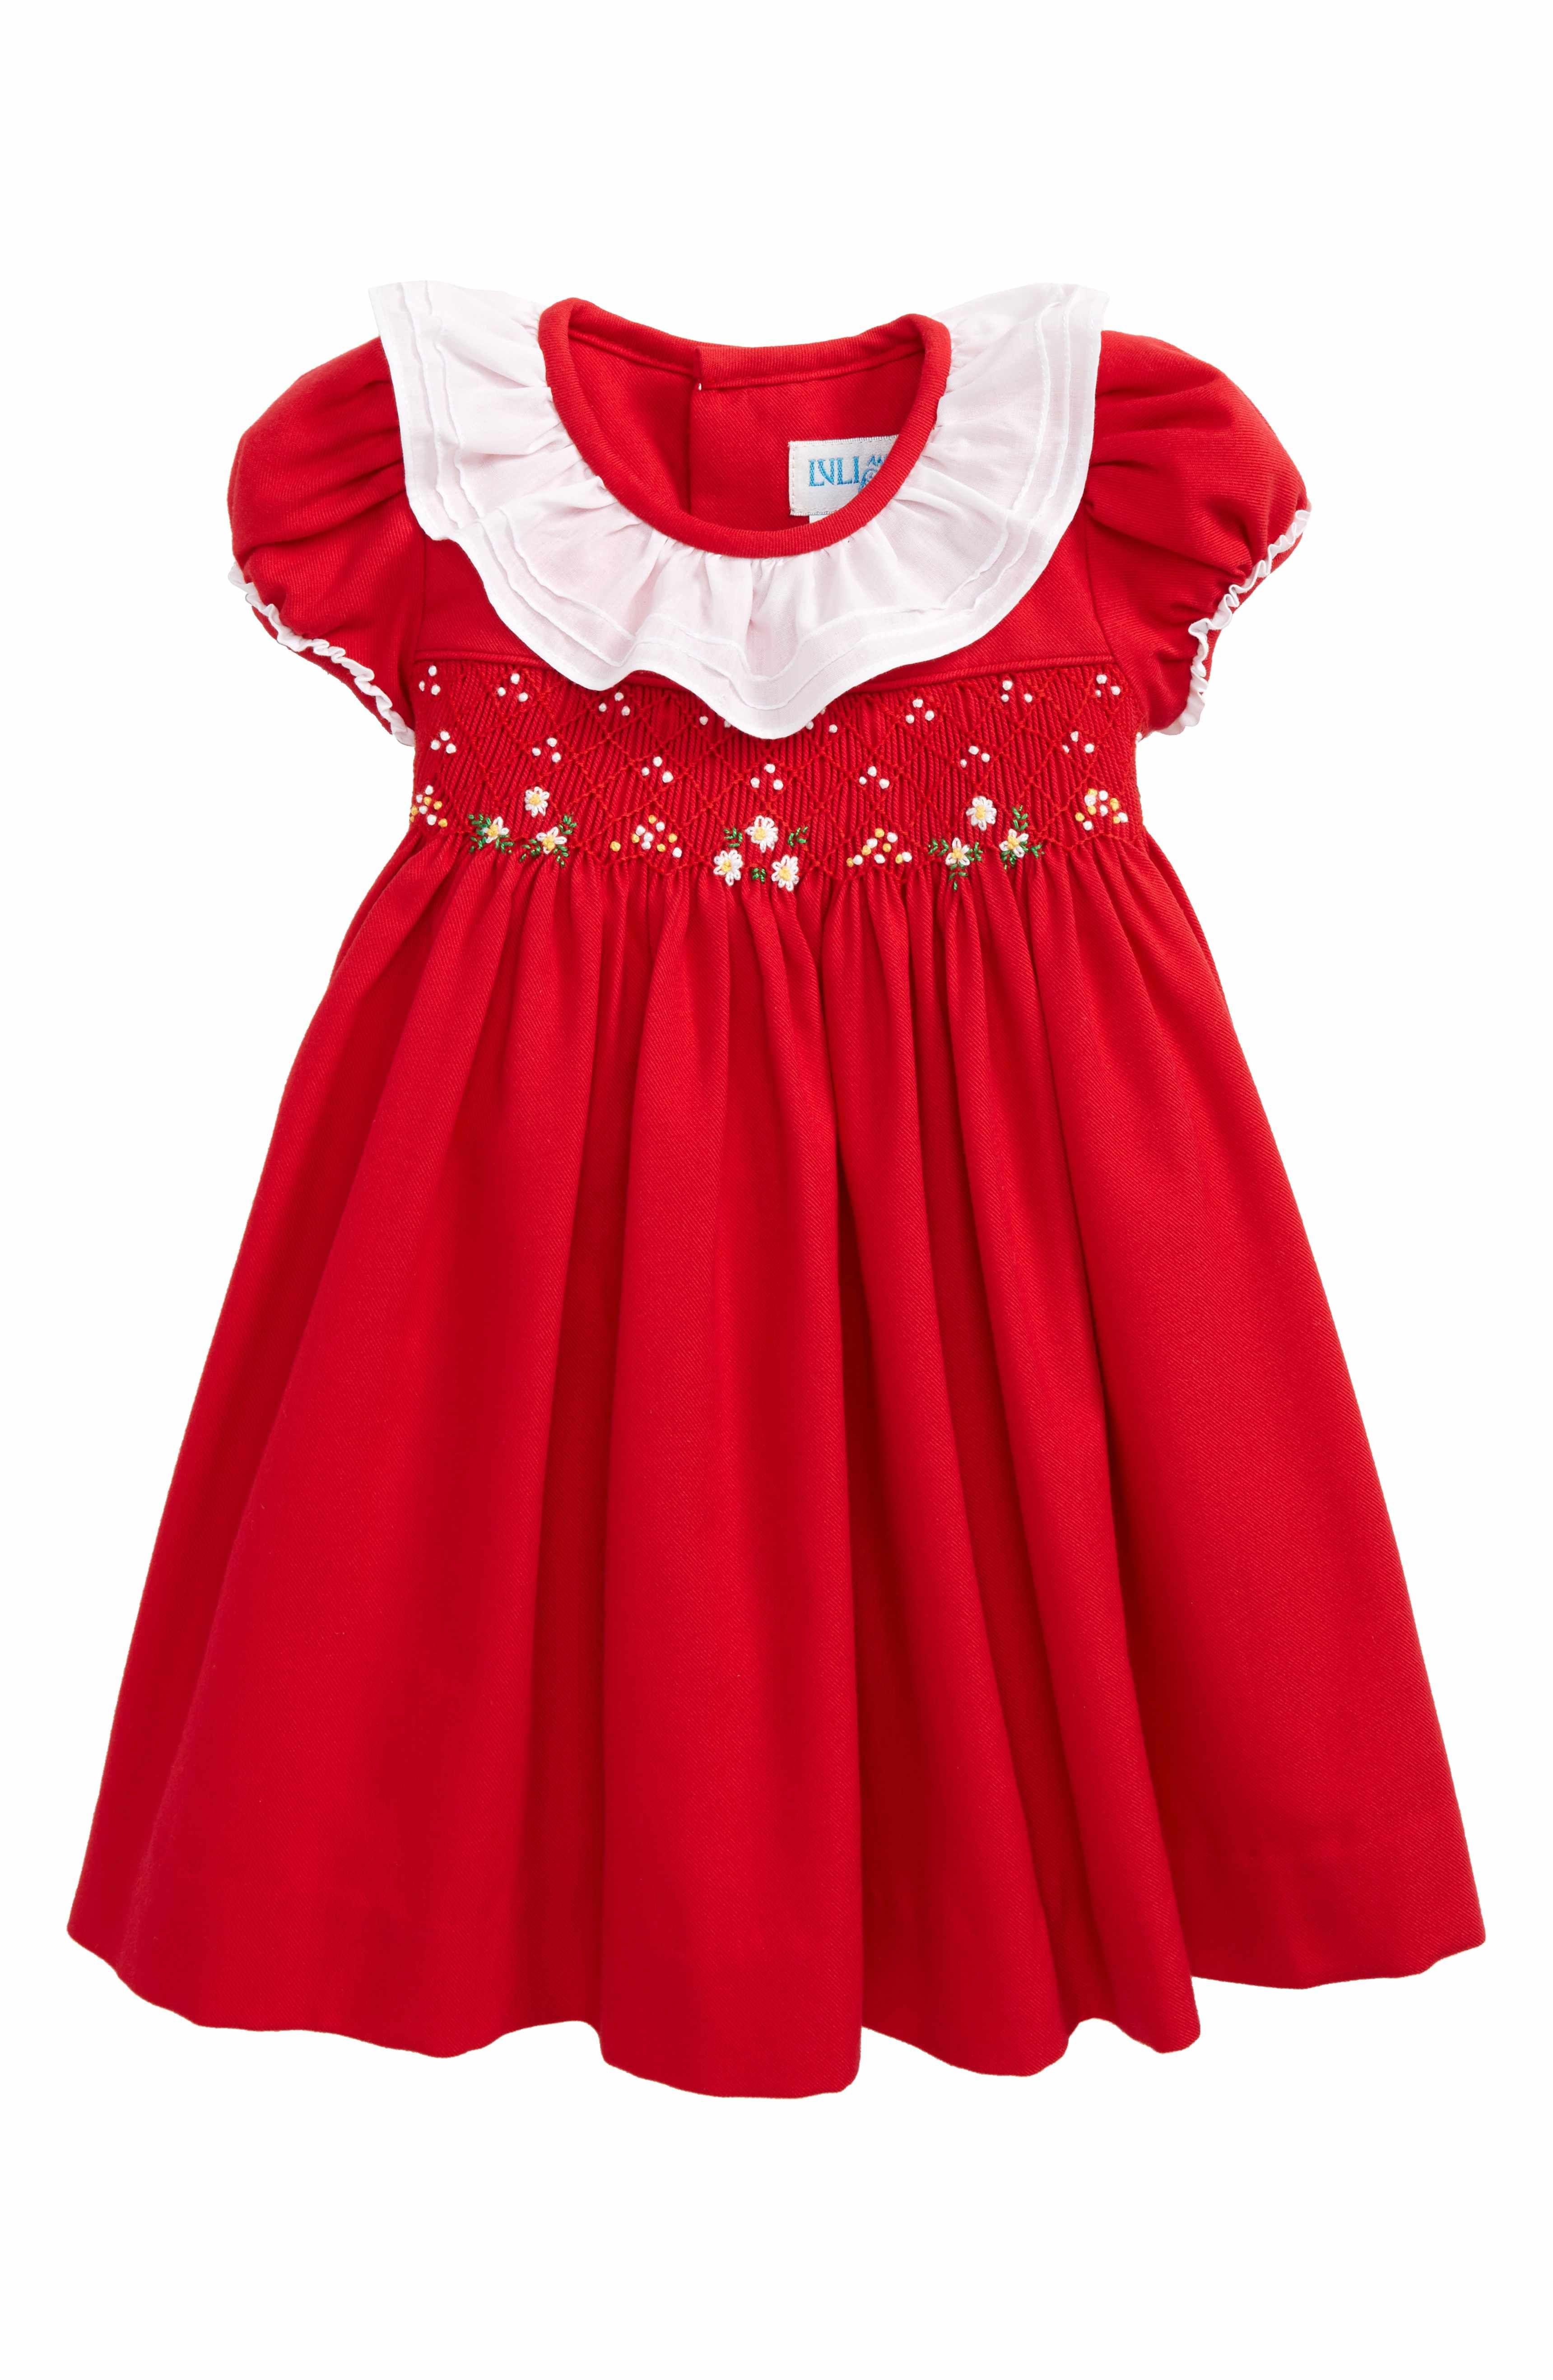 Main Image Luli & Me Viyella Smocked Dress Baby Girls